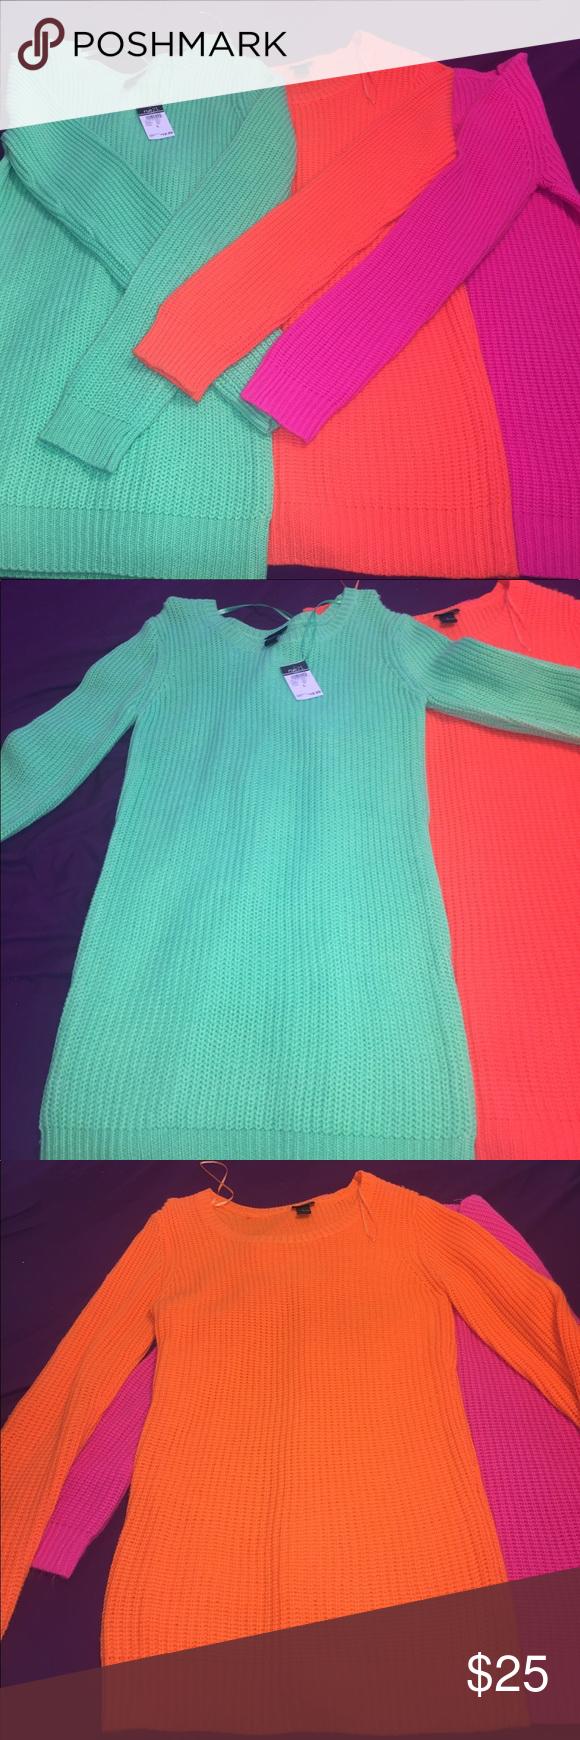 Bundle Deal: 3 Rue21 tunic sweaters | Keys, Cotton and Matching set